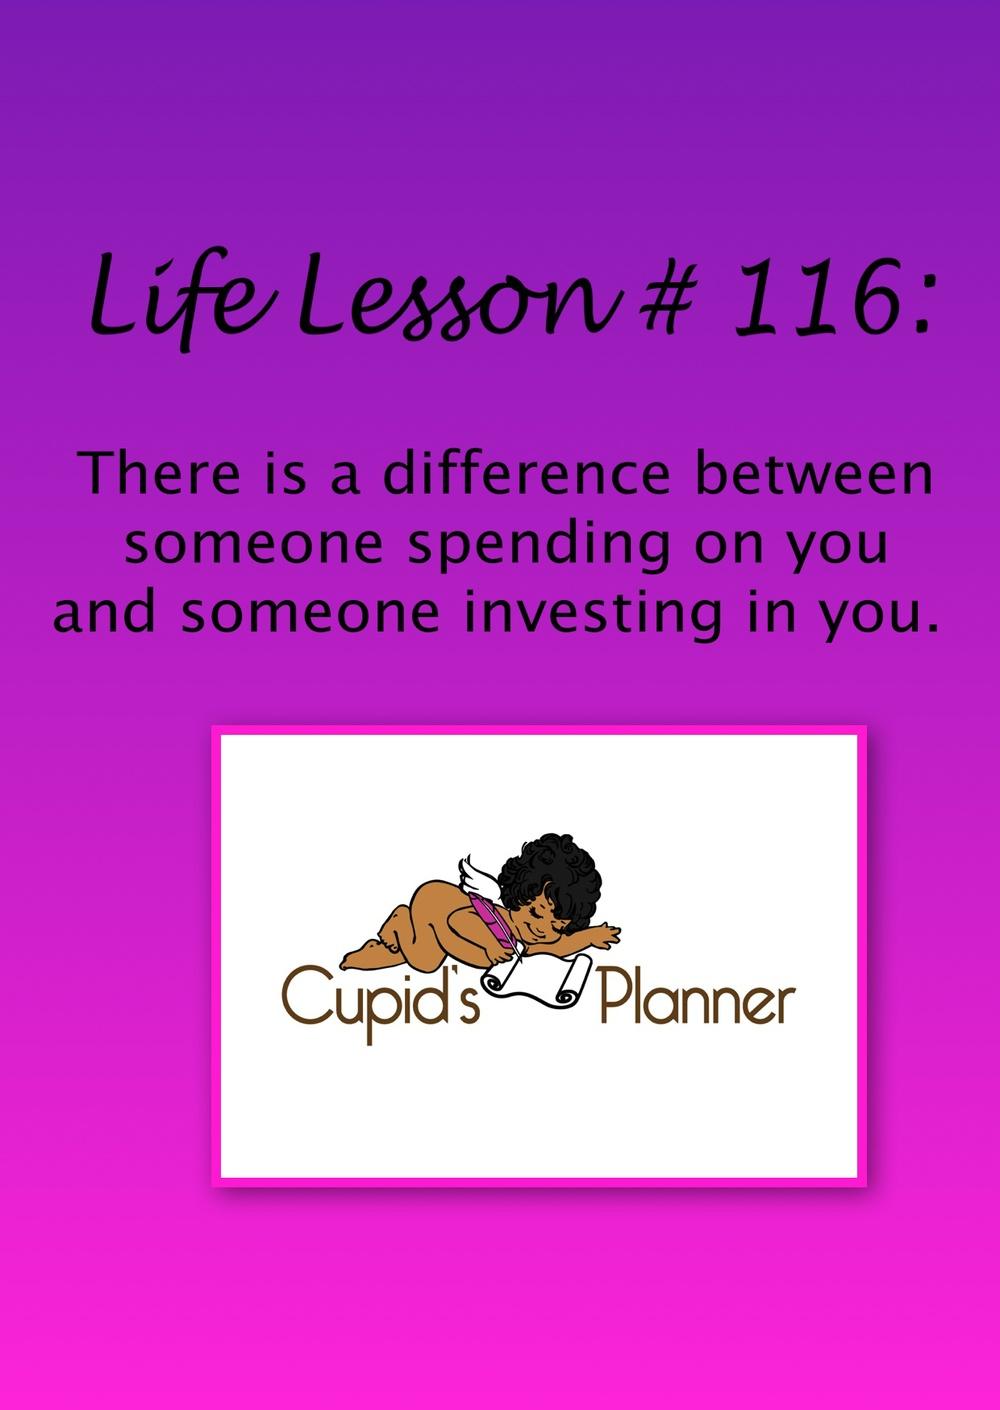 Life Lessonw